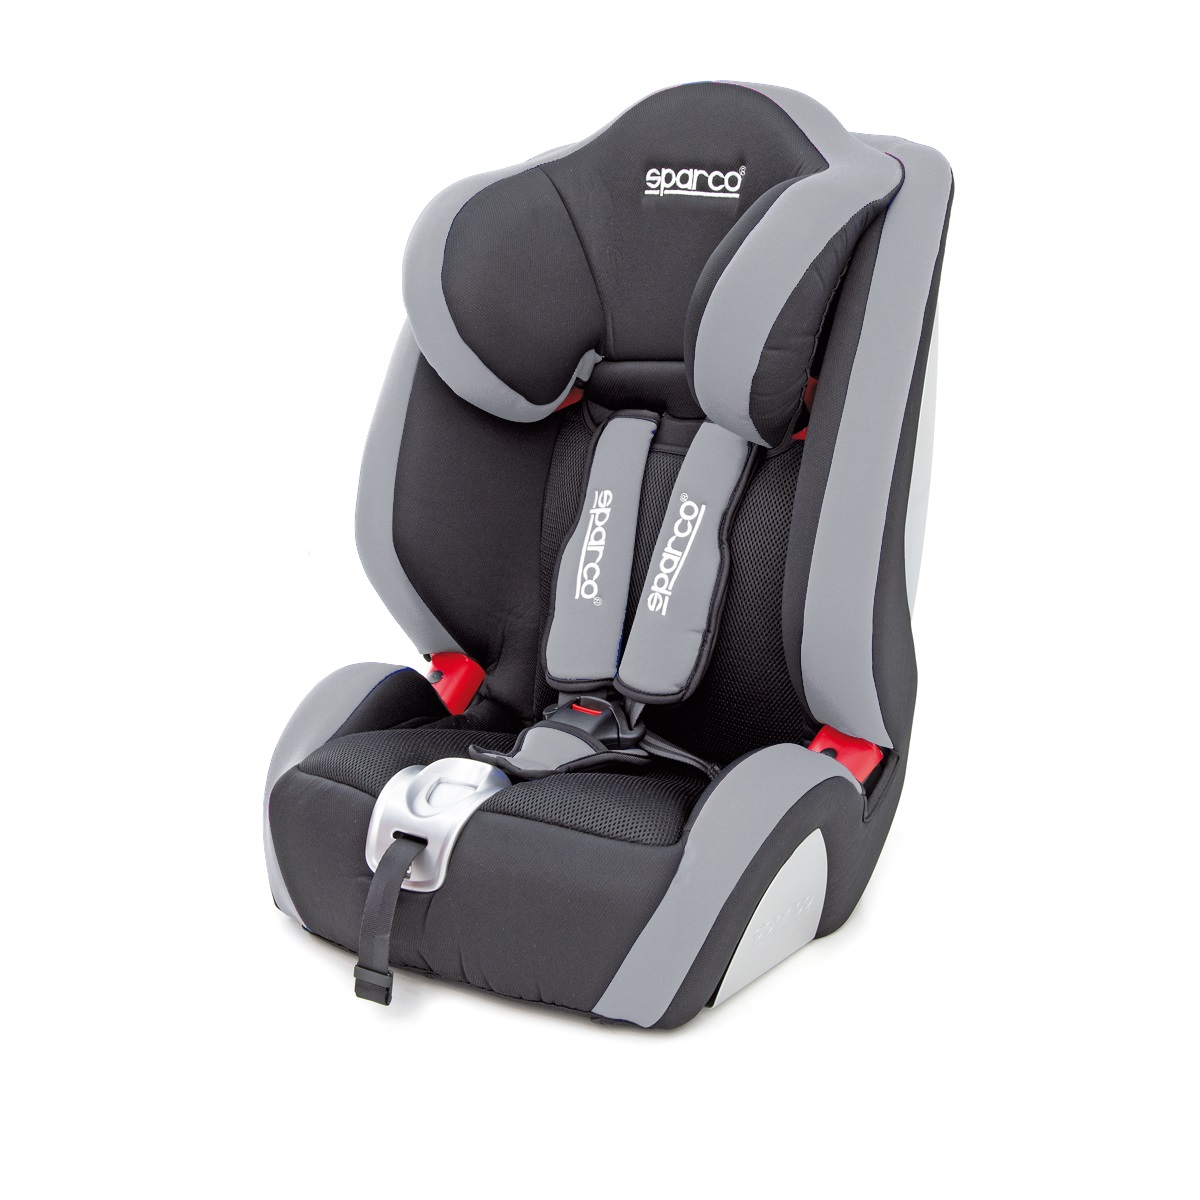 Сиденье Sparco Spc/dk-350 bk/gy сиденье sparco spc dk 500 bk bl